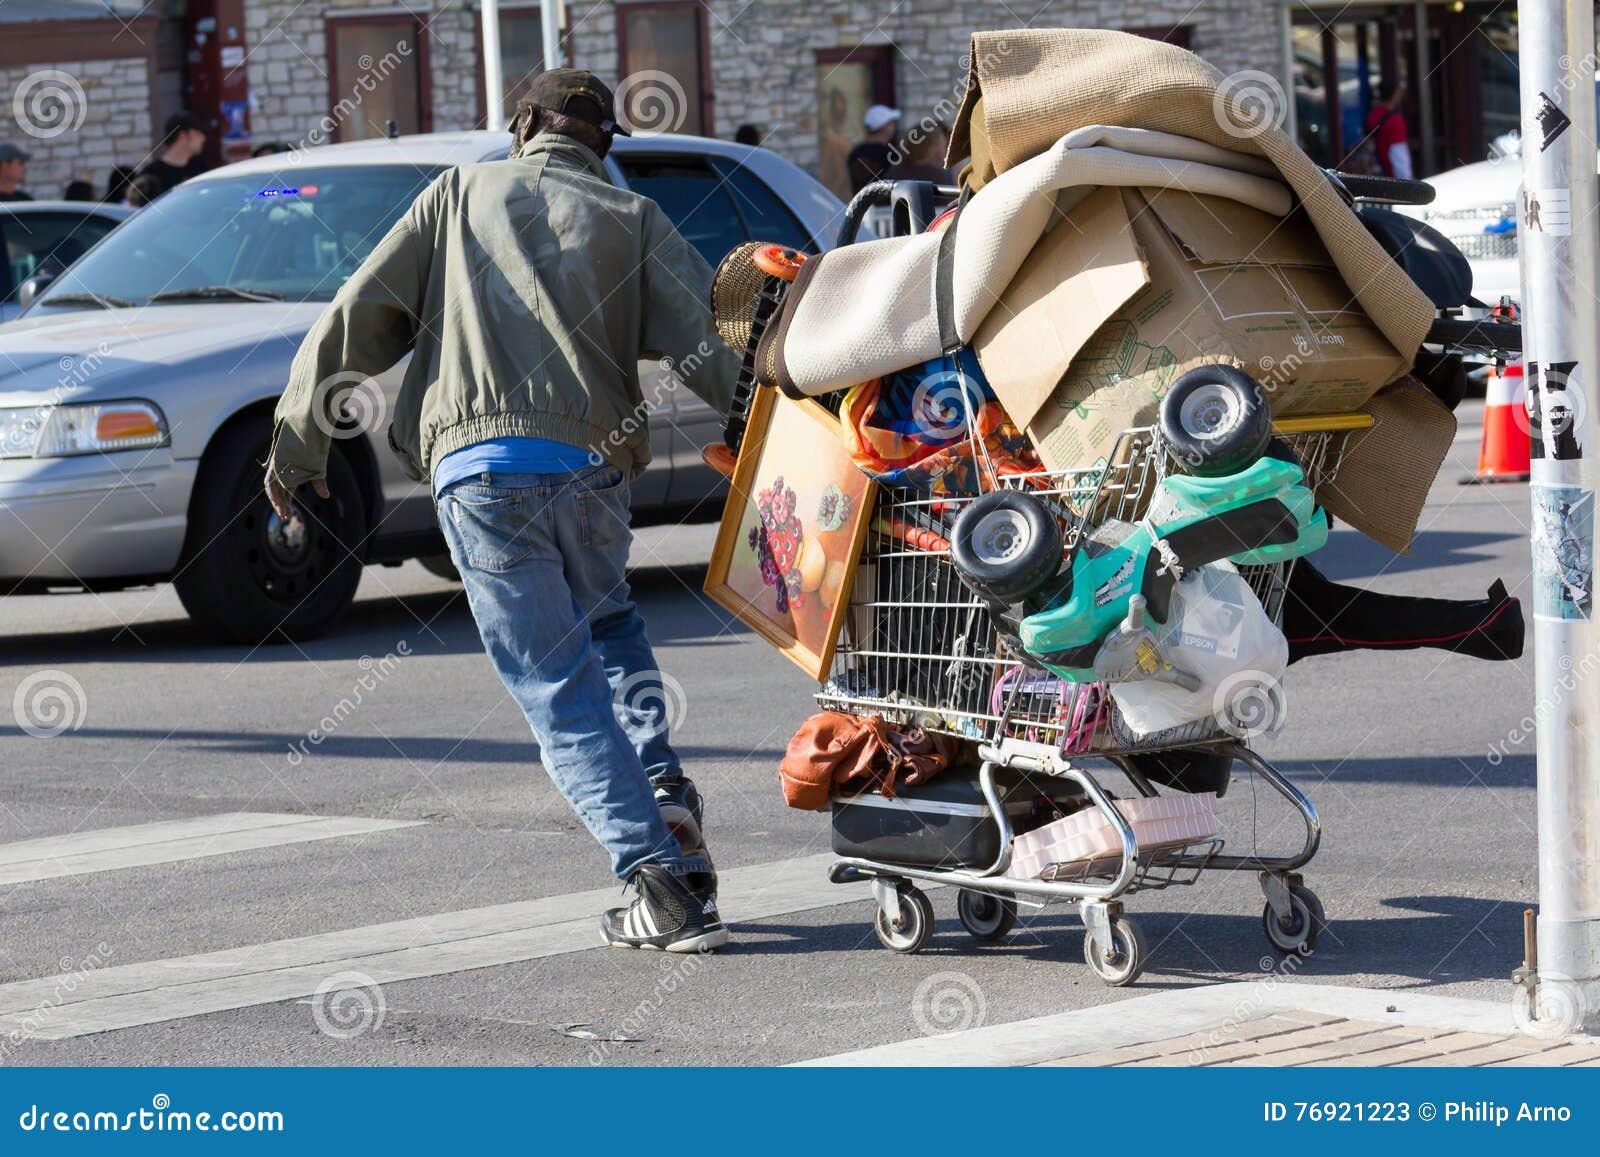 Fully loaded shopping cart